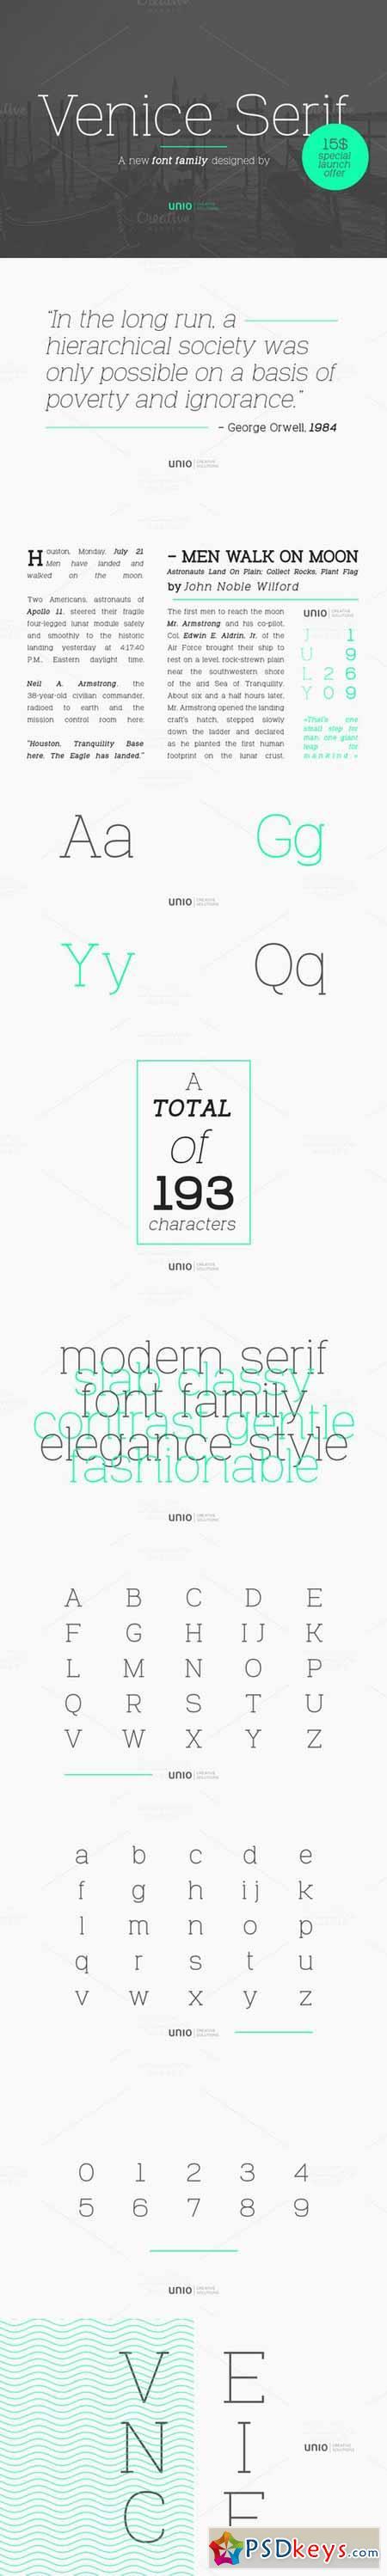 Venice Serif - Font Family 462153